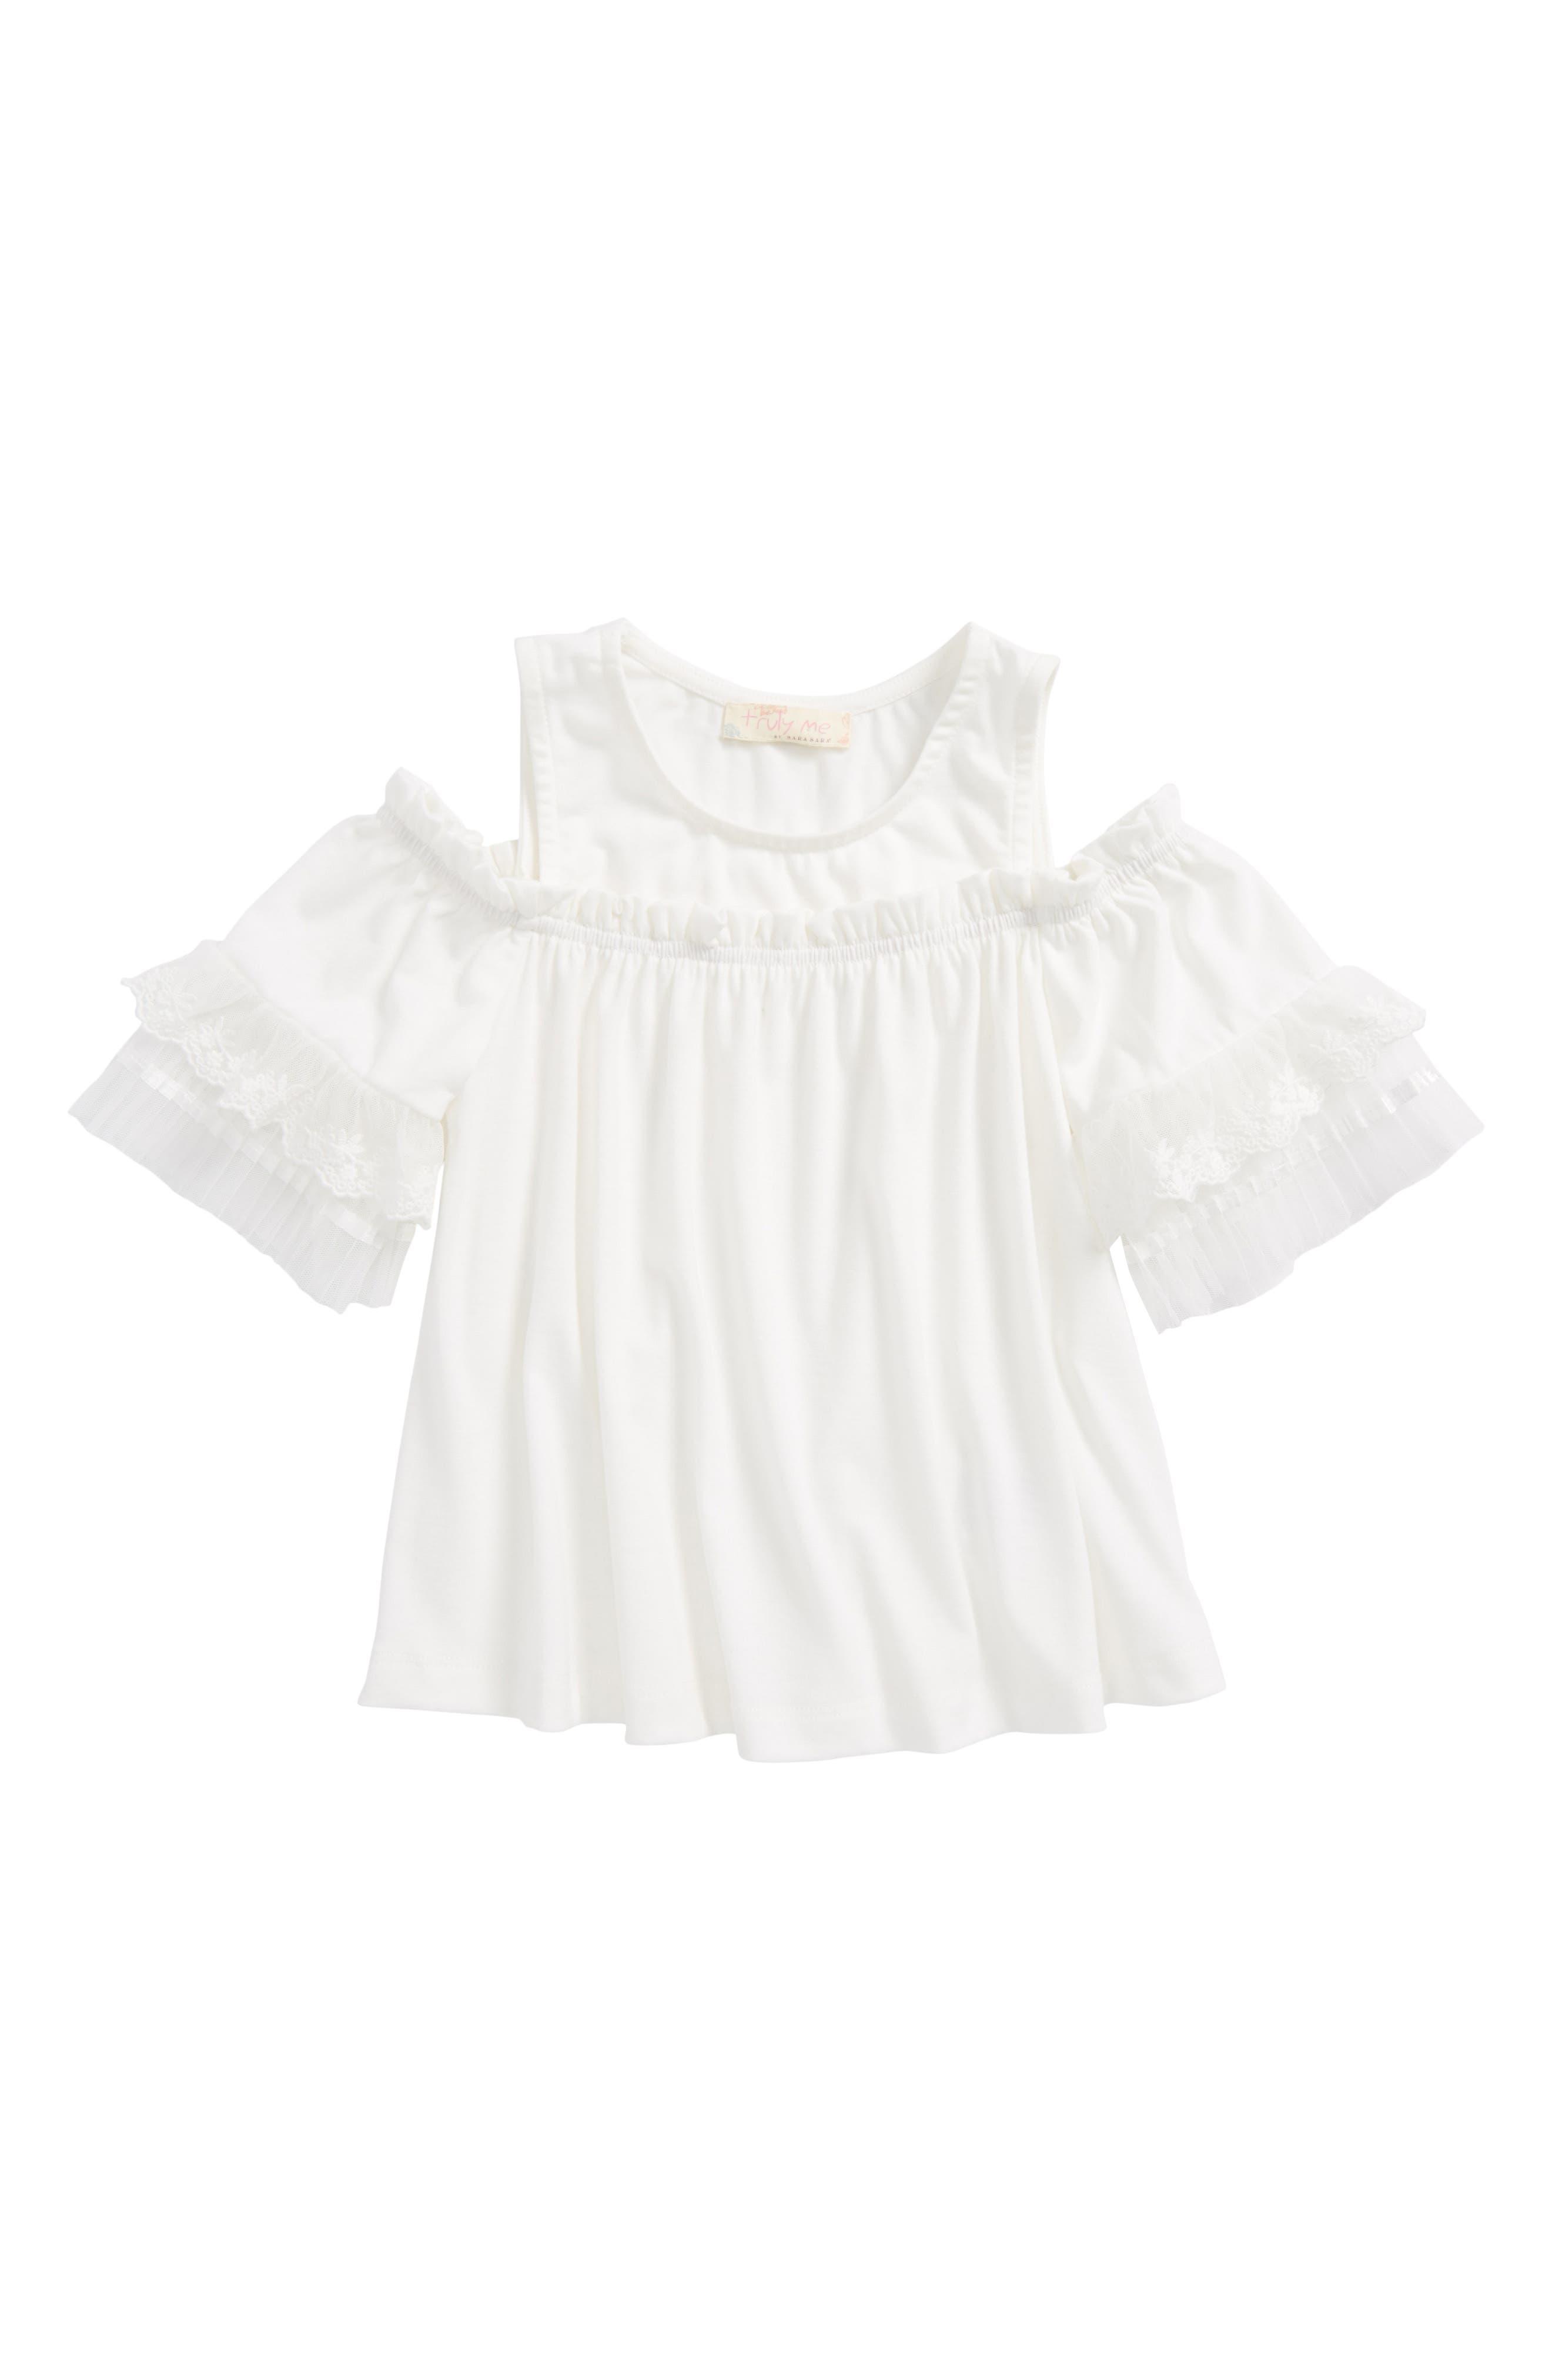 Cold Shoulder Top,                         Main,                         color, Off White